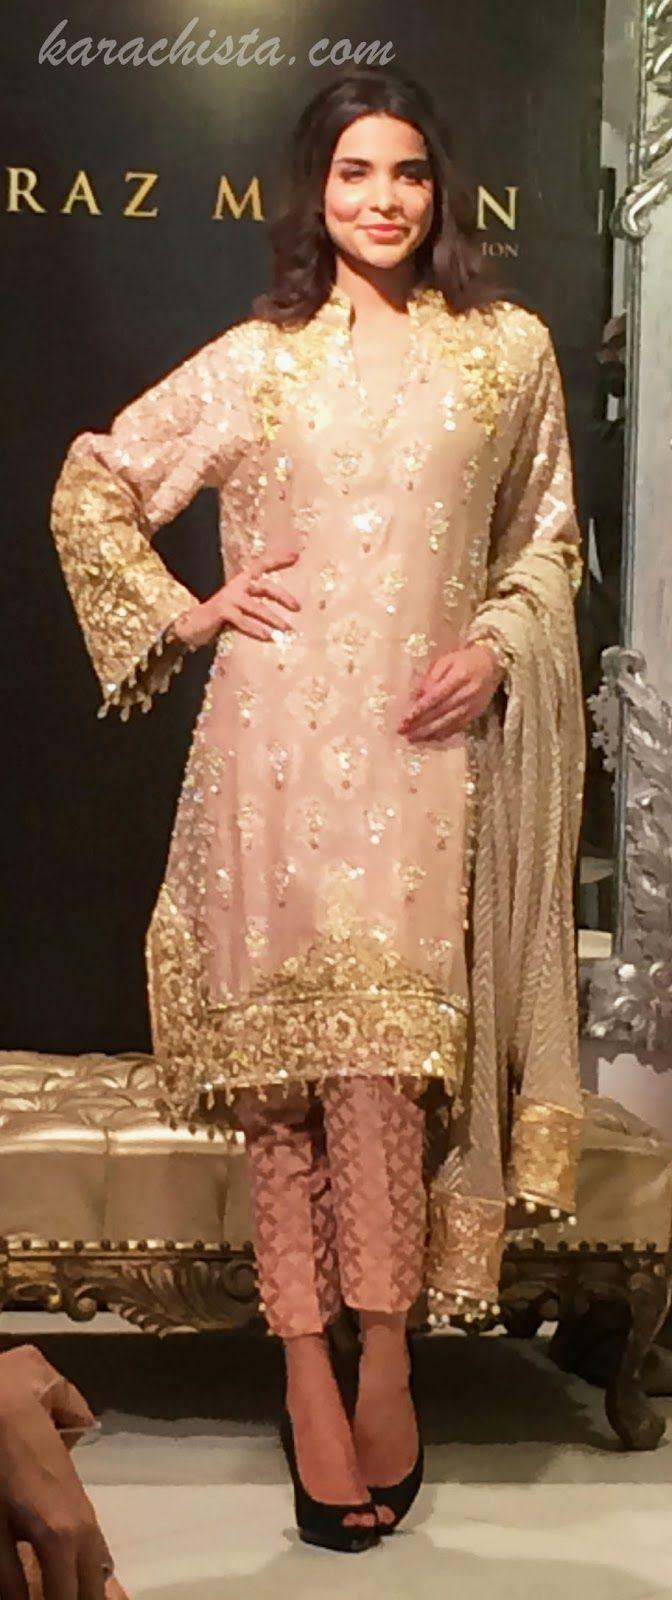 Modern dress of pakistan 2016 - I M Kinda Feelin This Short Shirts Fashion Now Faraz Manan Collection Pakistani Couturepakistani Outfitsbridal